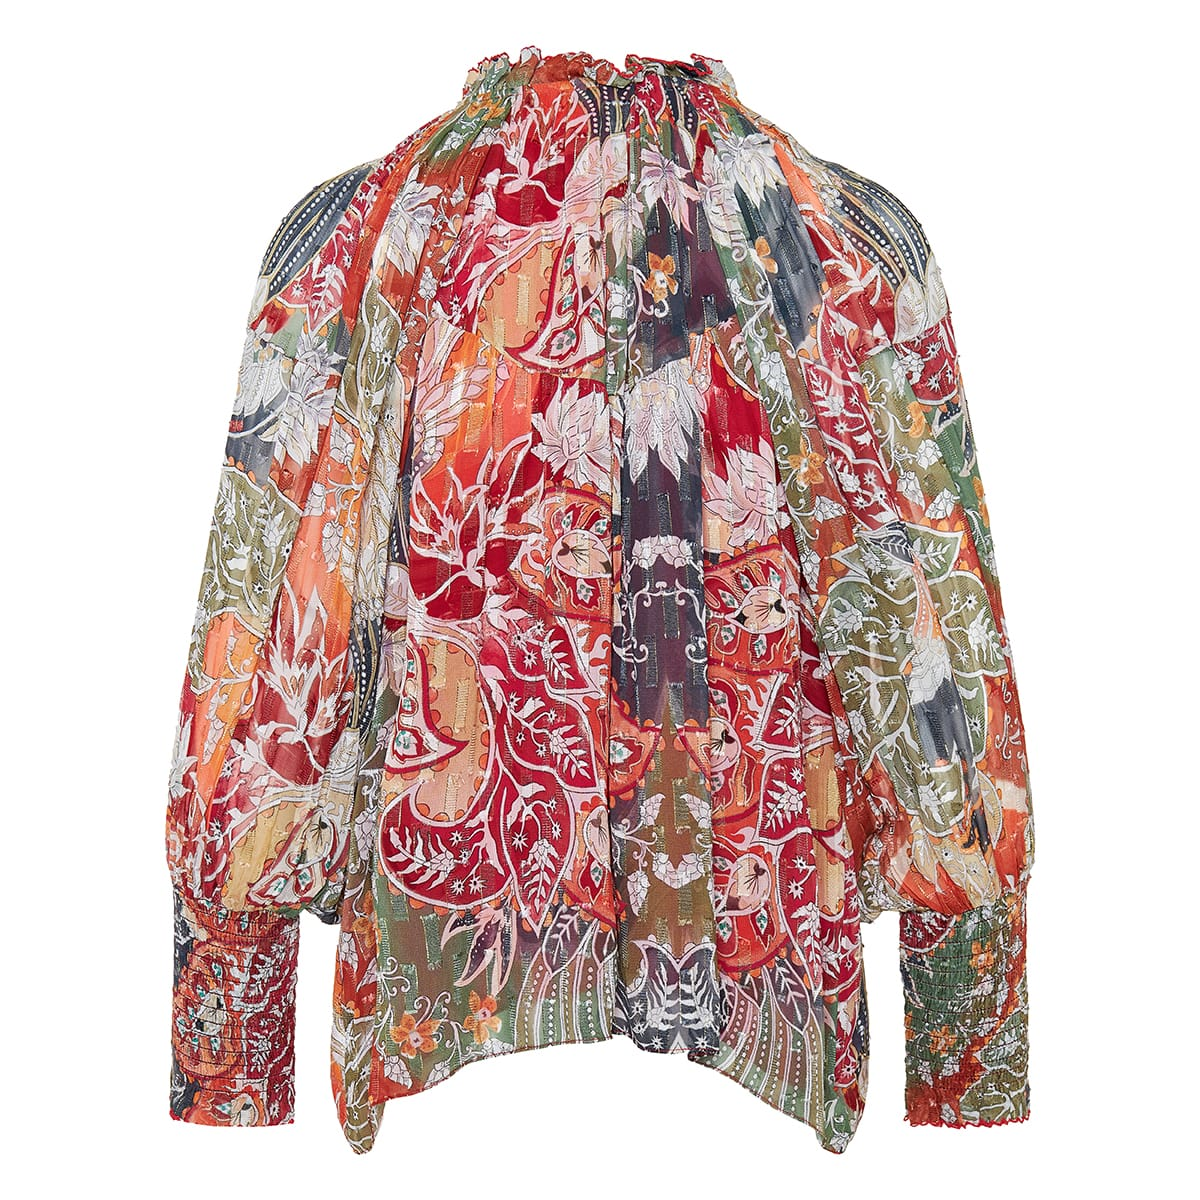 Kan printed gathered blouse